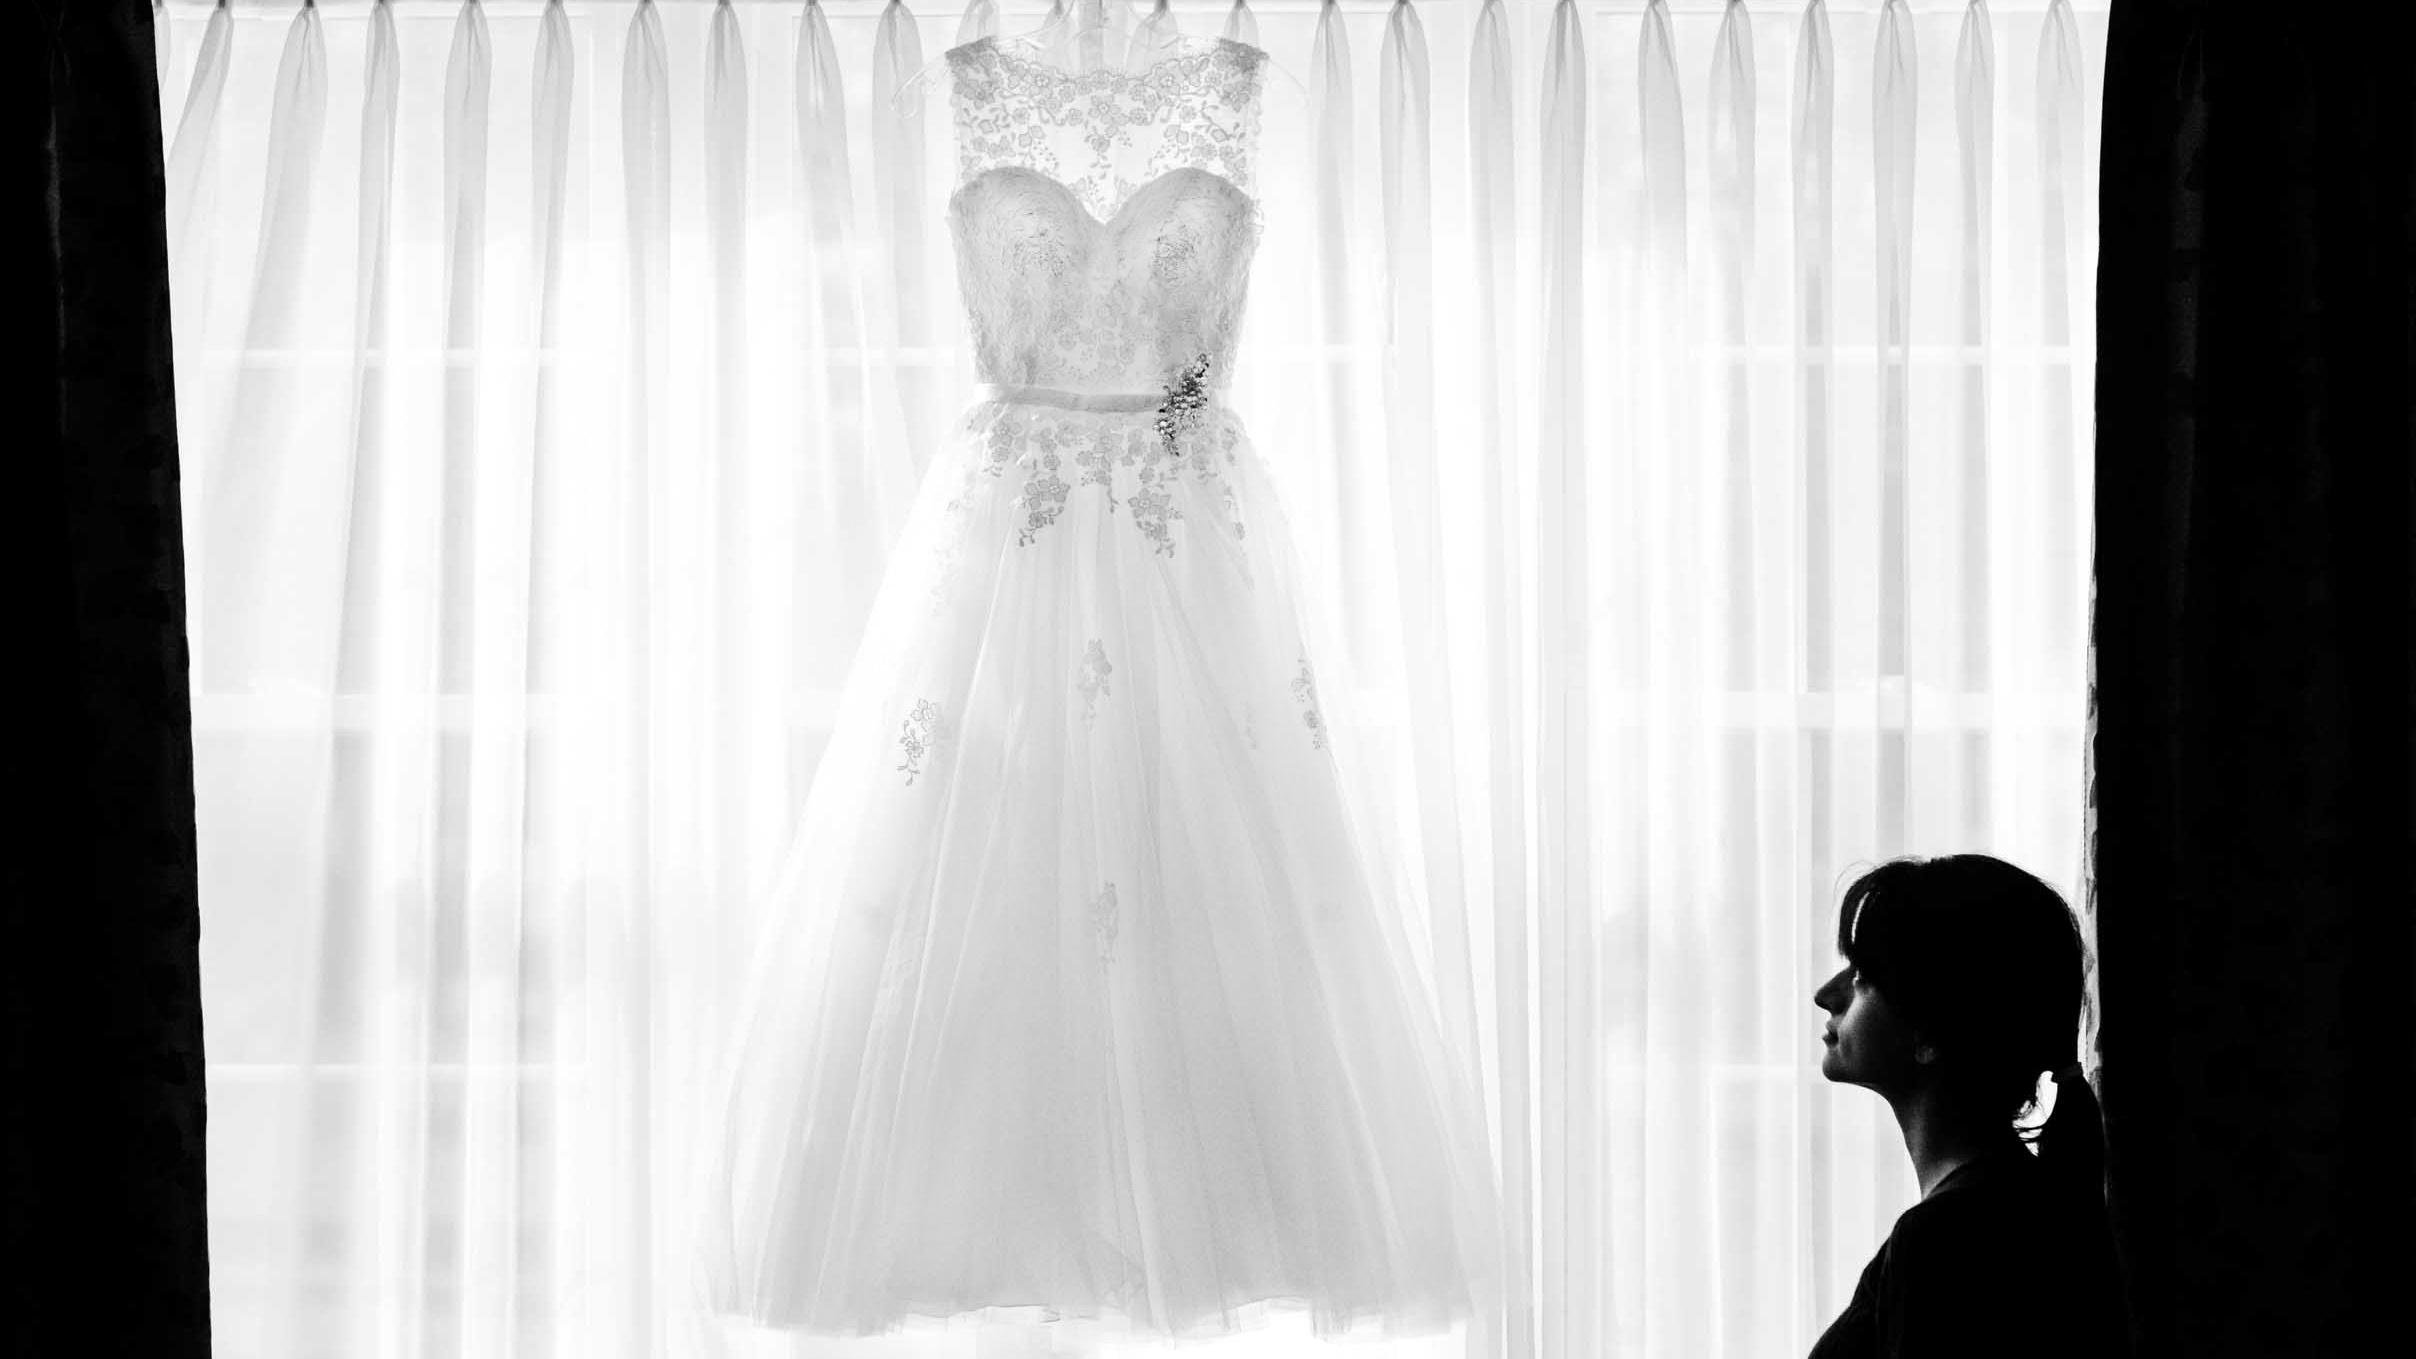 dc+metro+wedding+photographer+vadym+guliuk+photography+wedding+bride-2020.jpg